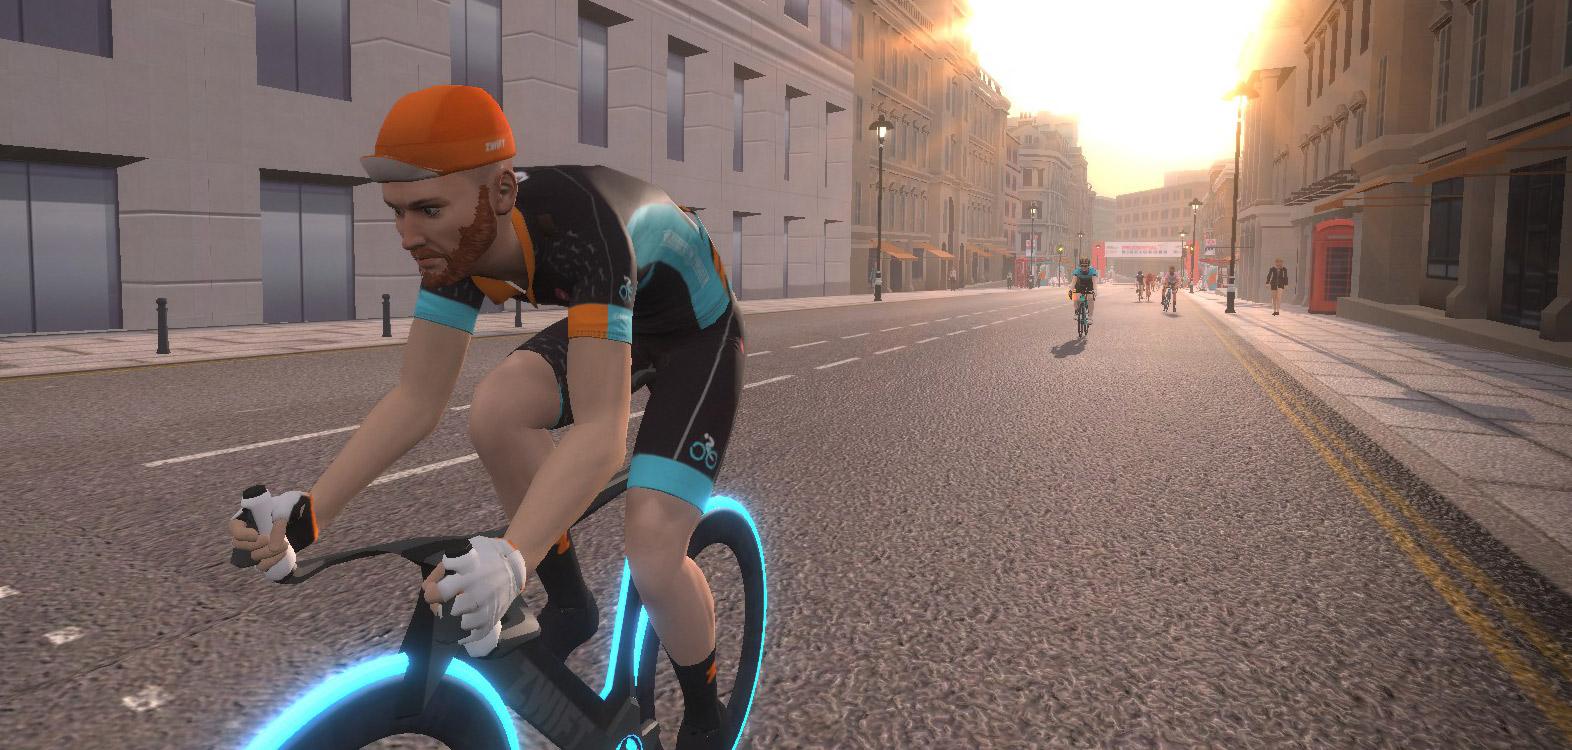 zwift insider virtual cycling training